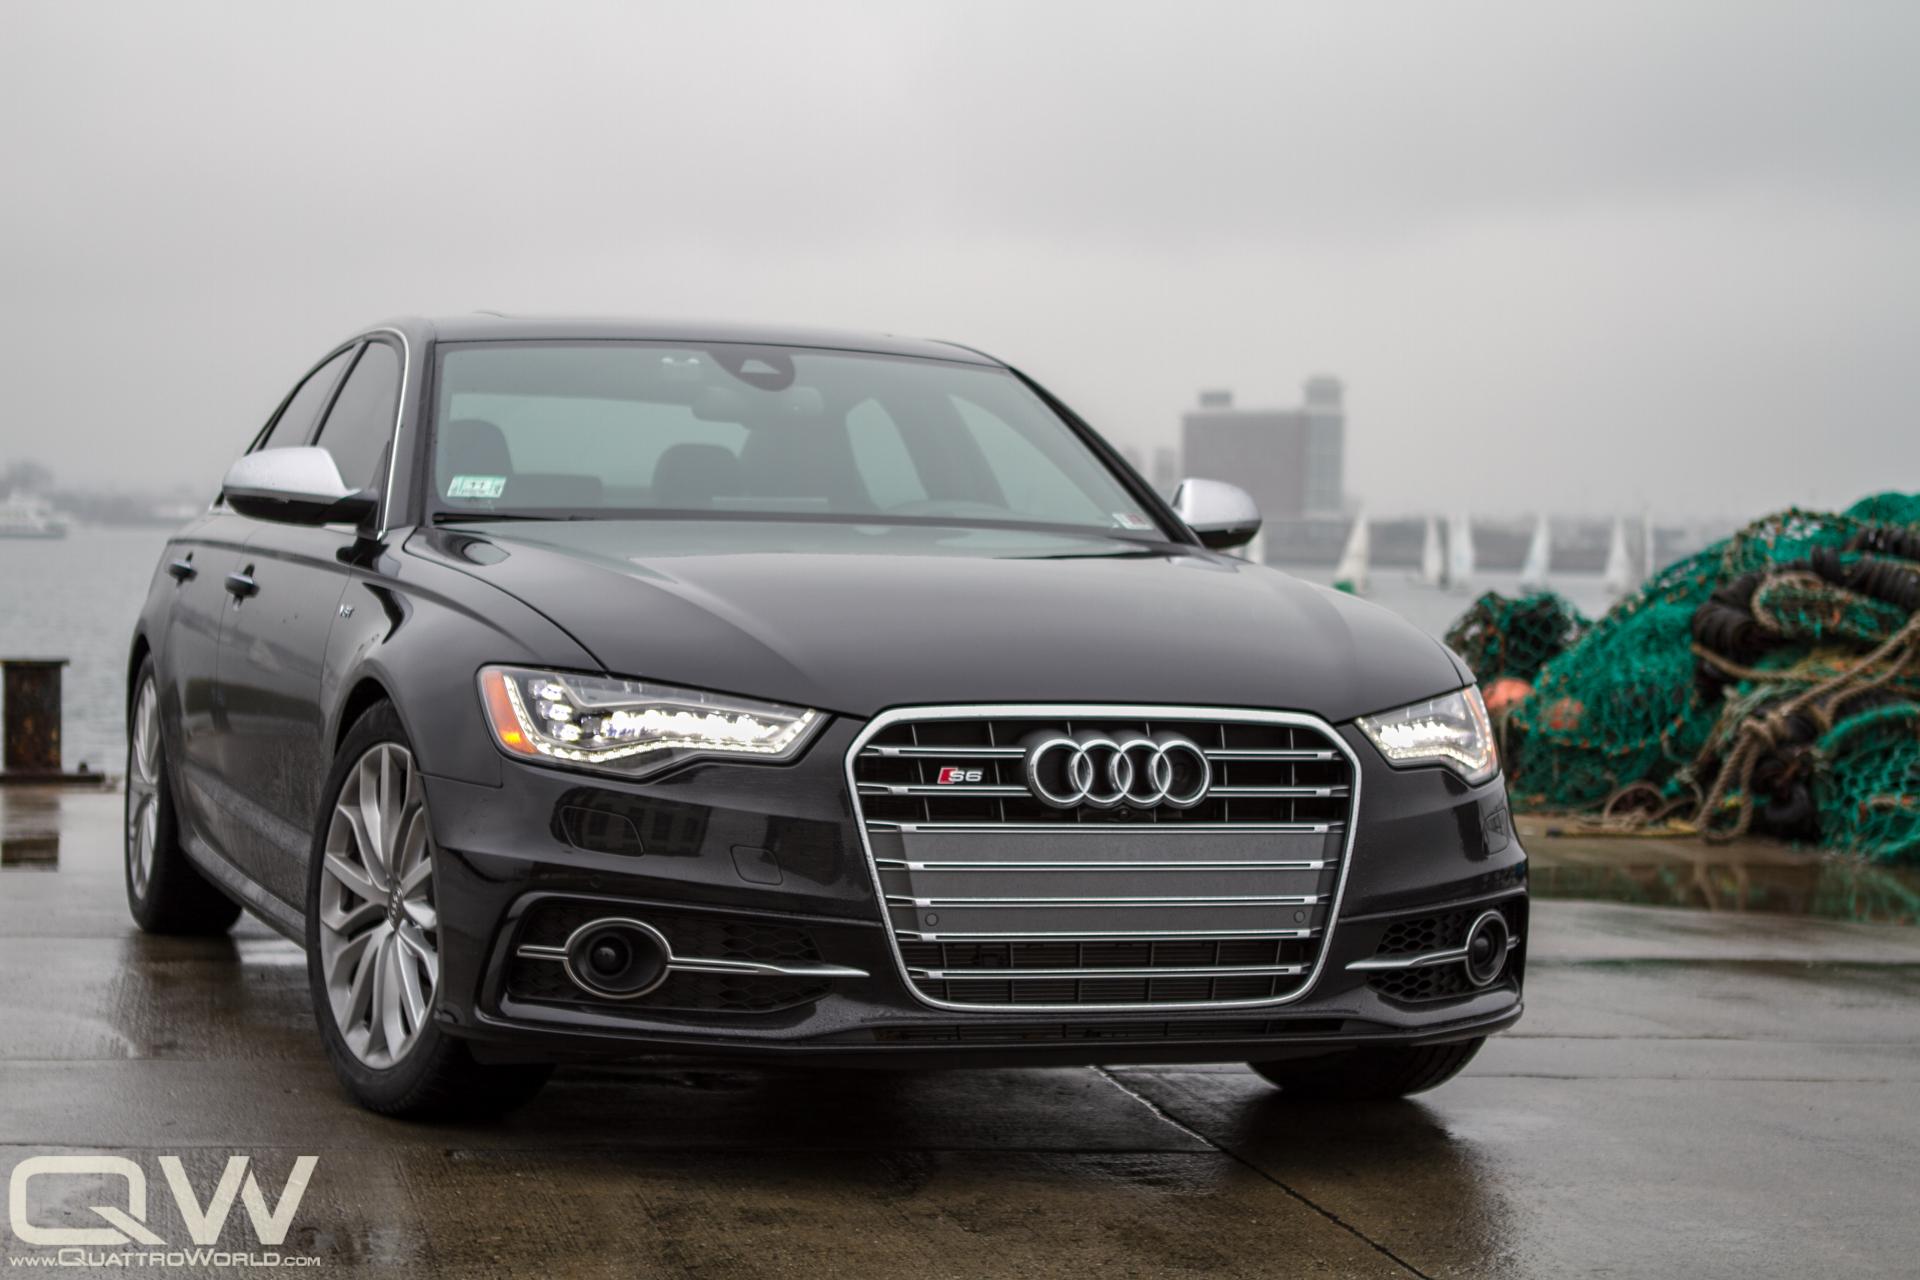 2013 Audi S6 Image 20